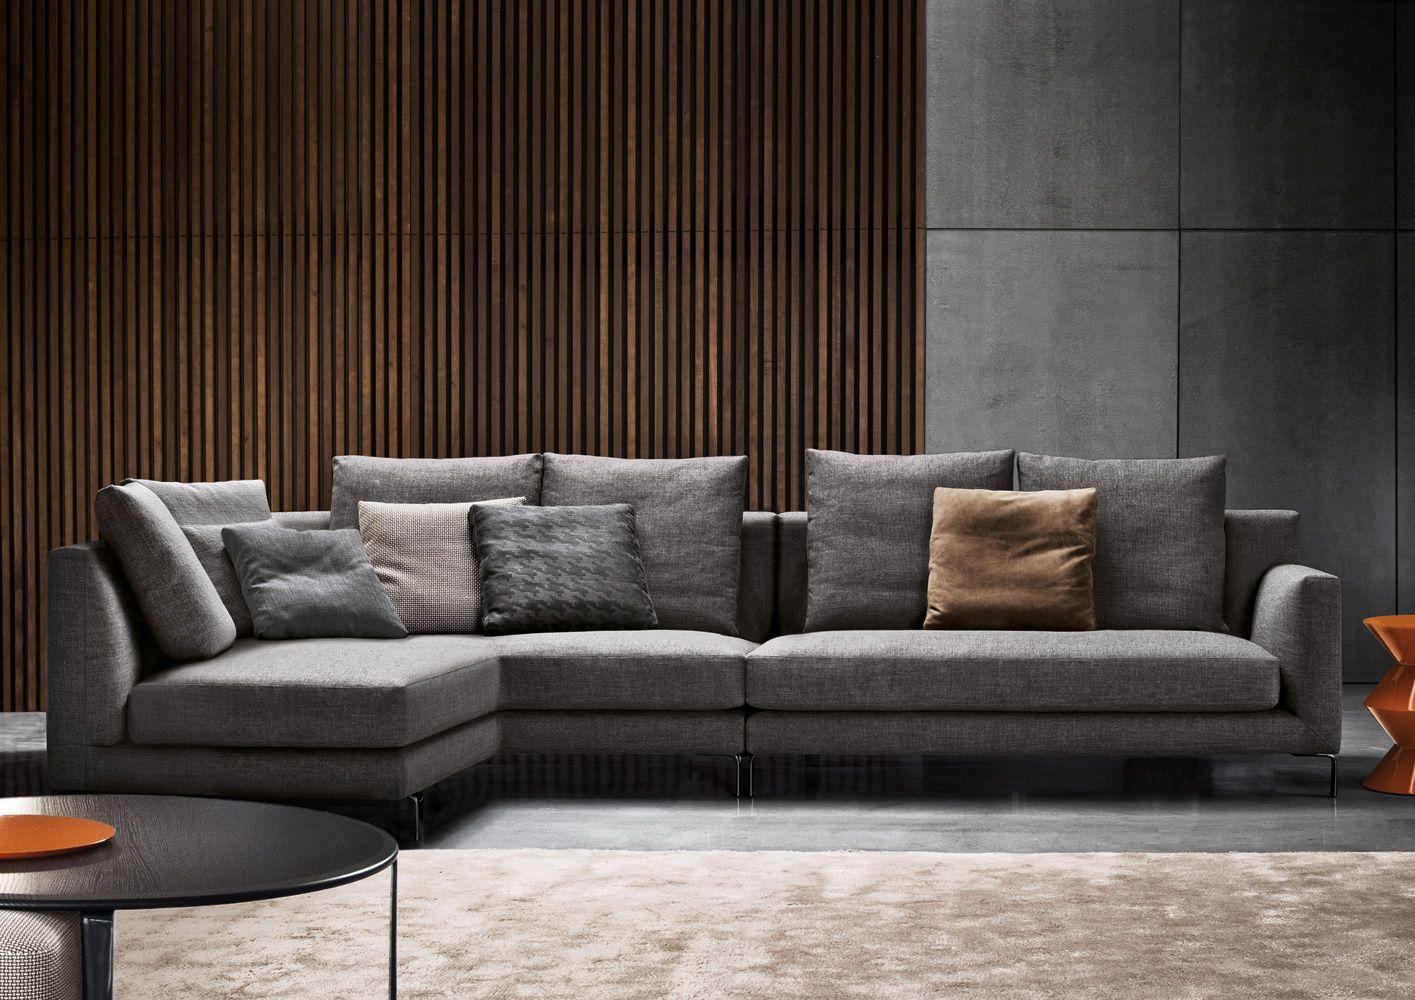 Canape Allen Minotti Living Room Design Modern Sofa Furniture Sofa Design Living room sofa furniture